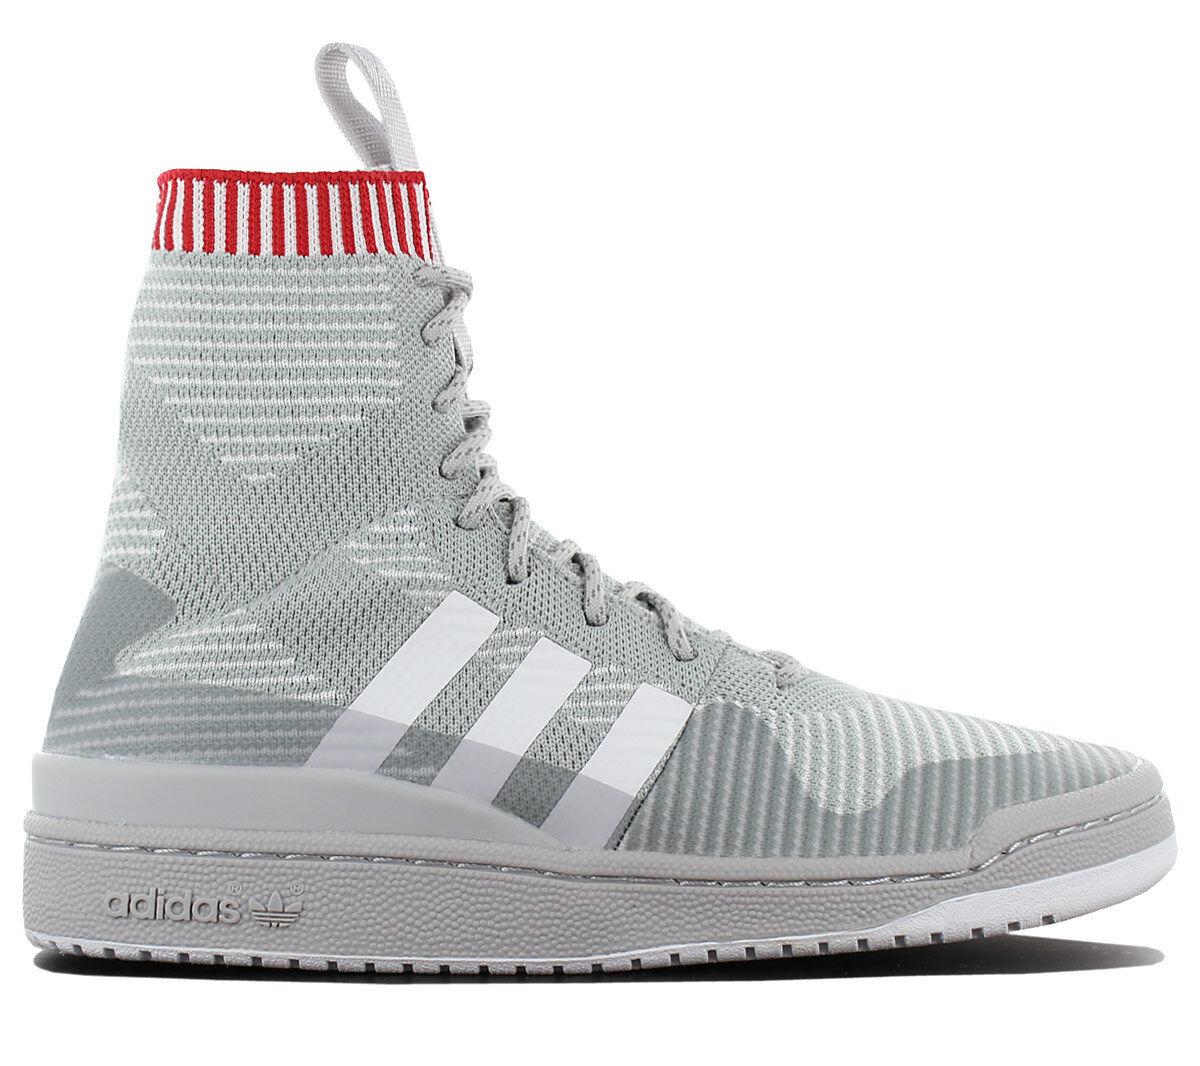 Adidas Originals Forum High PK PRIMEKNIT Schuhe Turnschuhe Stiefel Grau BZ0646 NEU